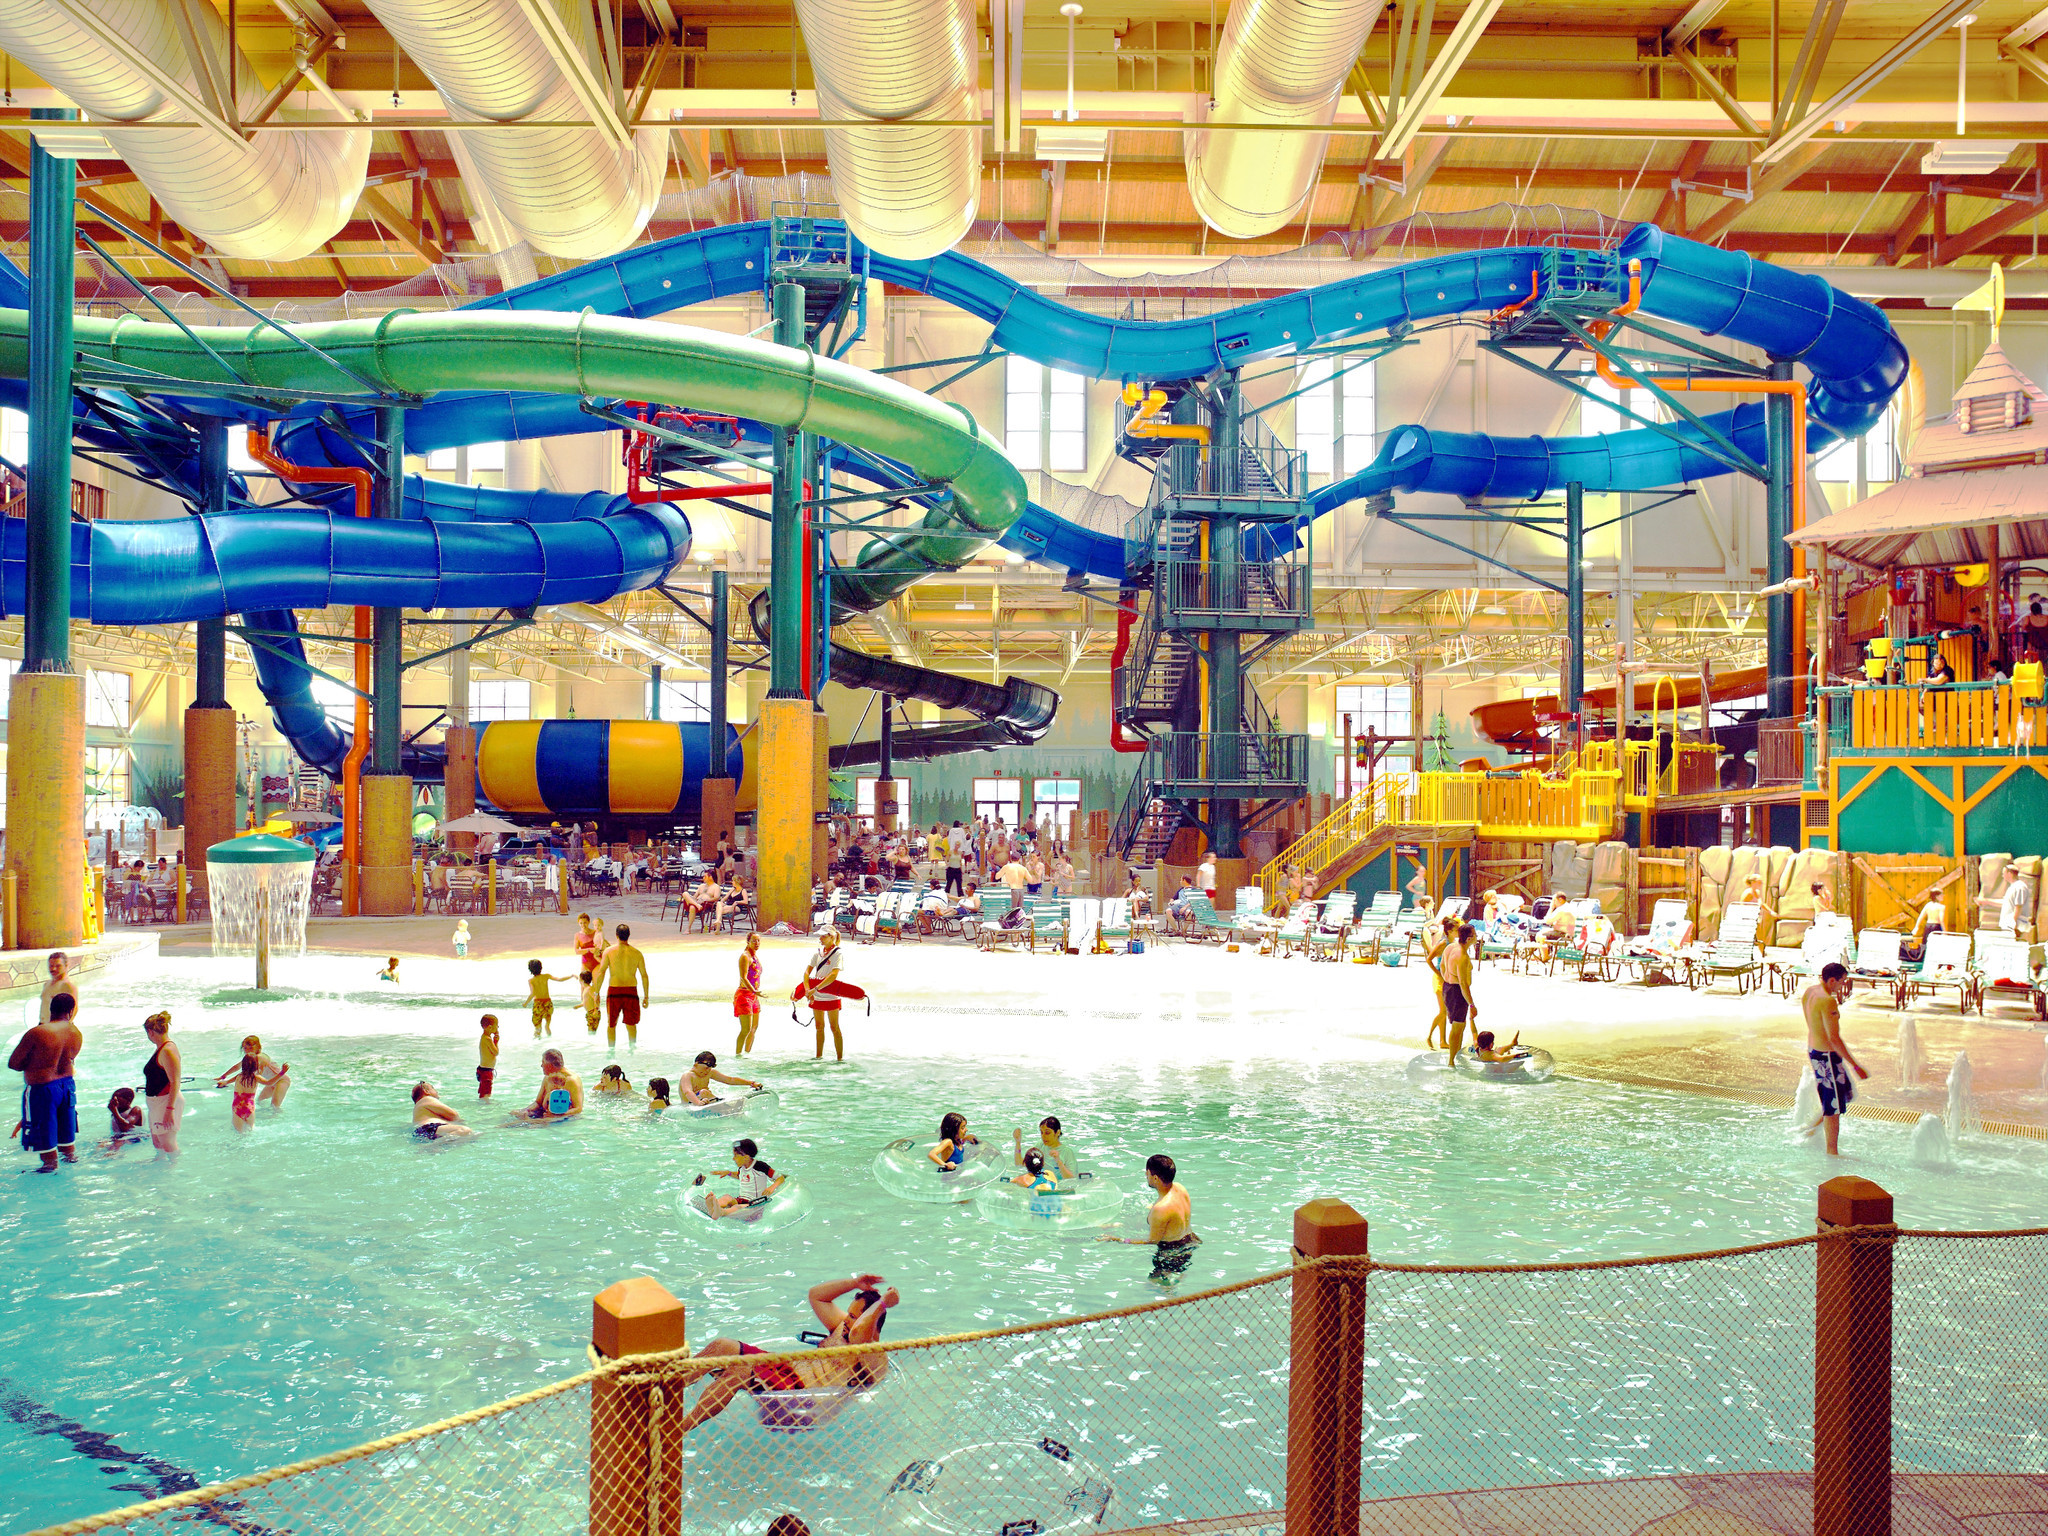 Fun Places For Kids In Ga Kids Matttroy